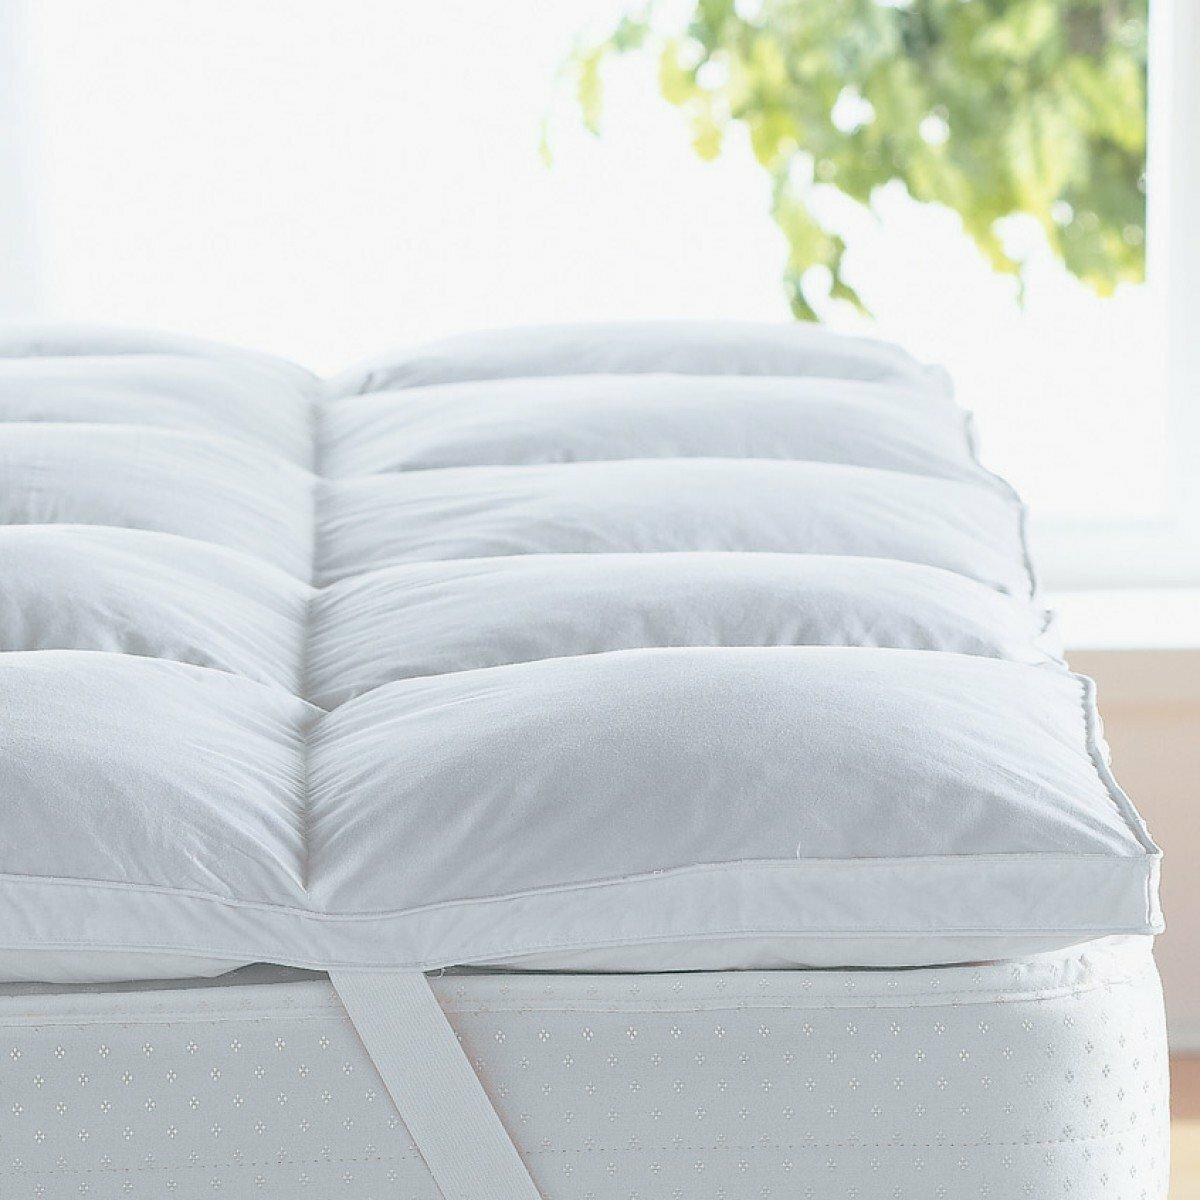 Alwyn Home Gerstner Thick Hypoallergenic 2 Down Alternative Bed Mattress Topper Reviews Wayfair